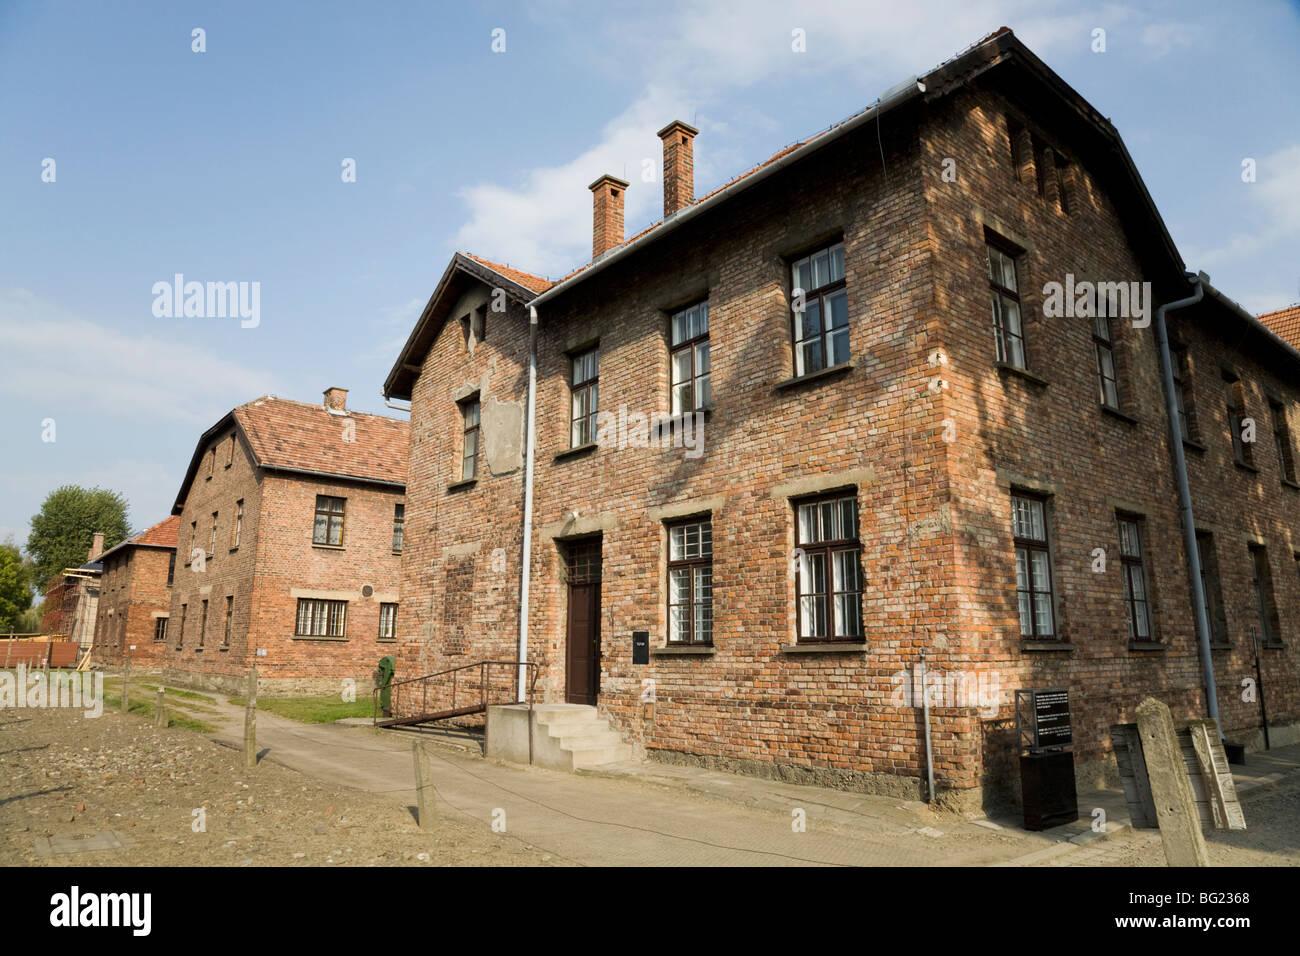 Prisoner accommodation blocks at the Auschwitz Nazi death camp in Oswiecim, Poland. - Stock Image